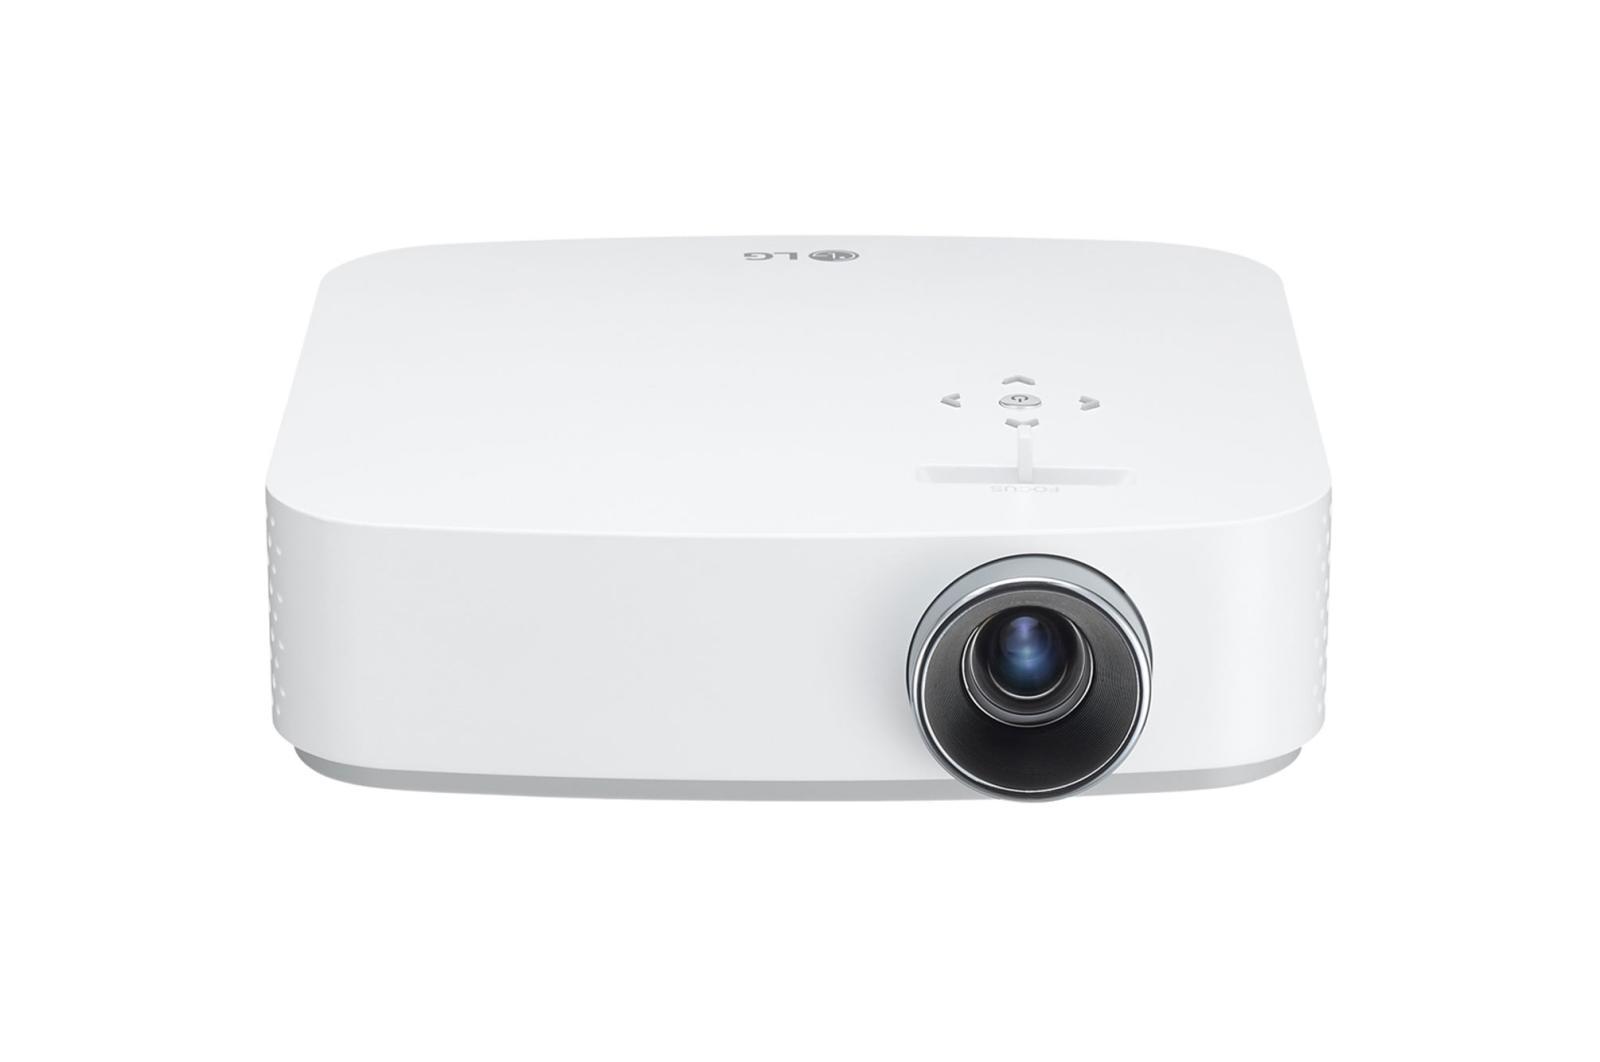 LG PF50KS LED Projektor Full-HD, 600 ANSI Lumen, WLAN, USB-C, Akku projektors